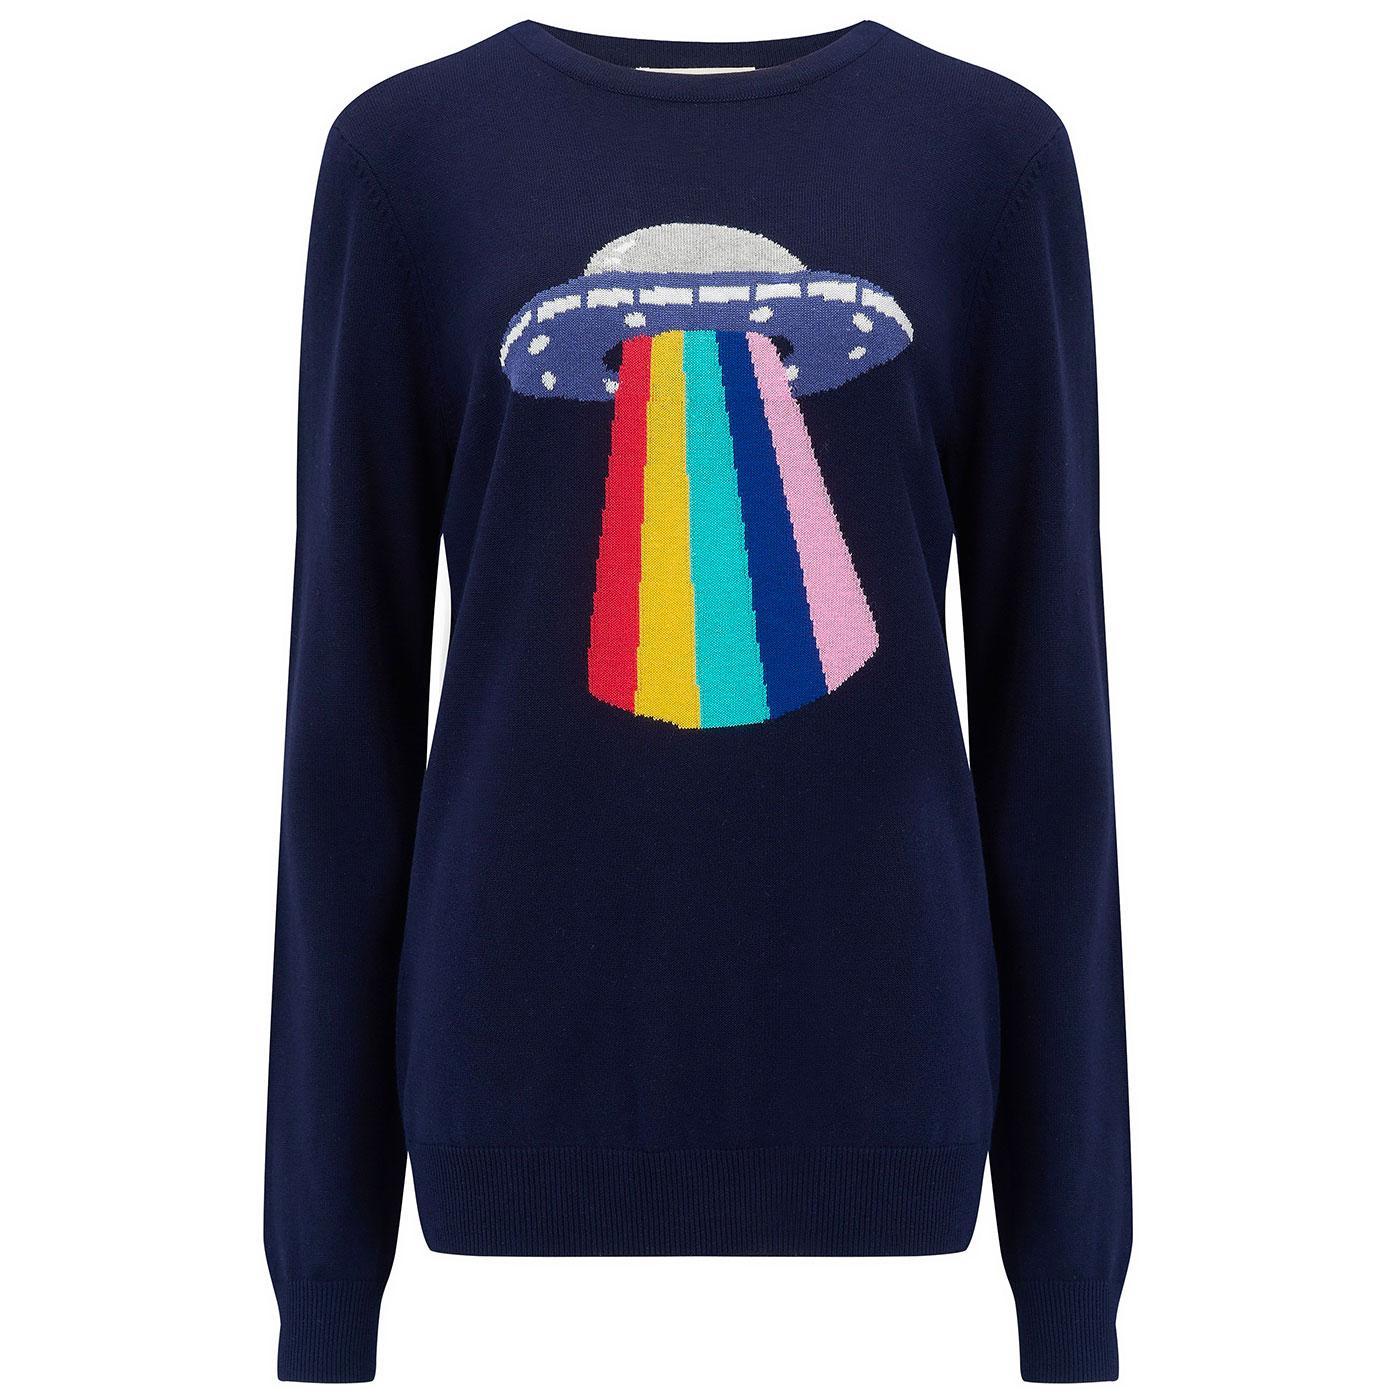 Rita SUGARHILL Retro UFO Rainbow Beam Jumper